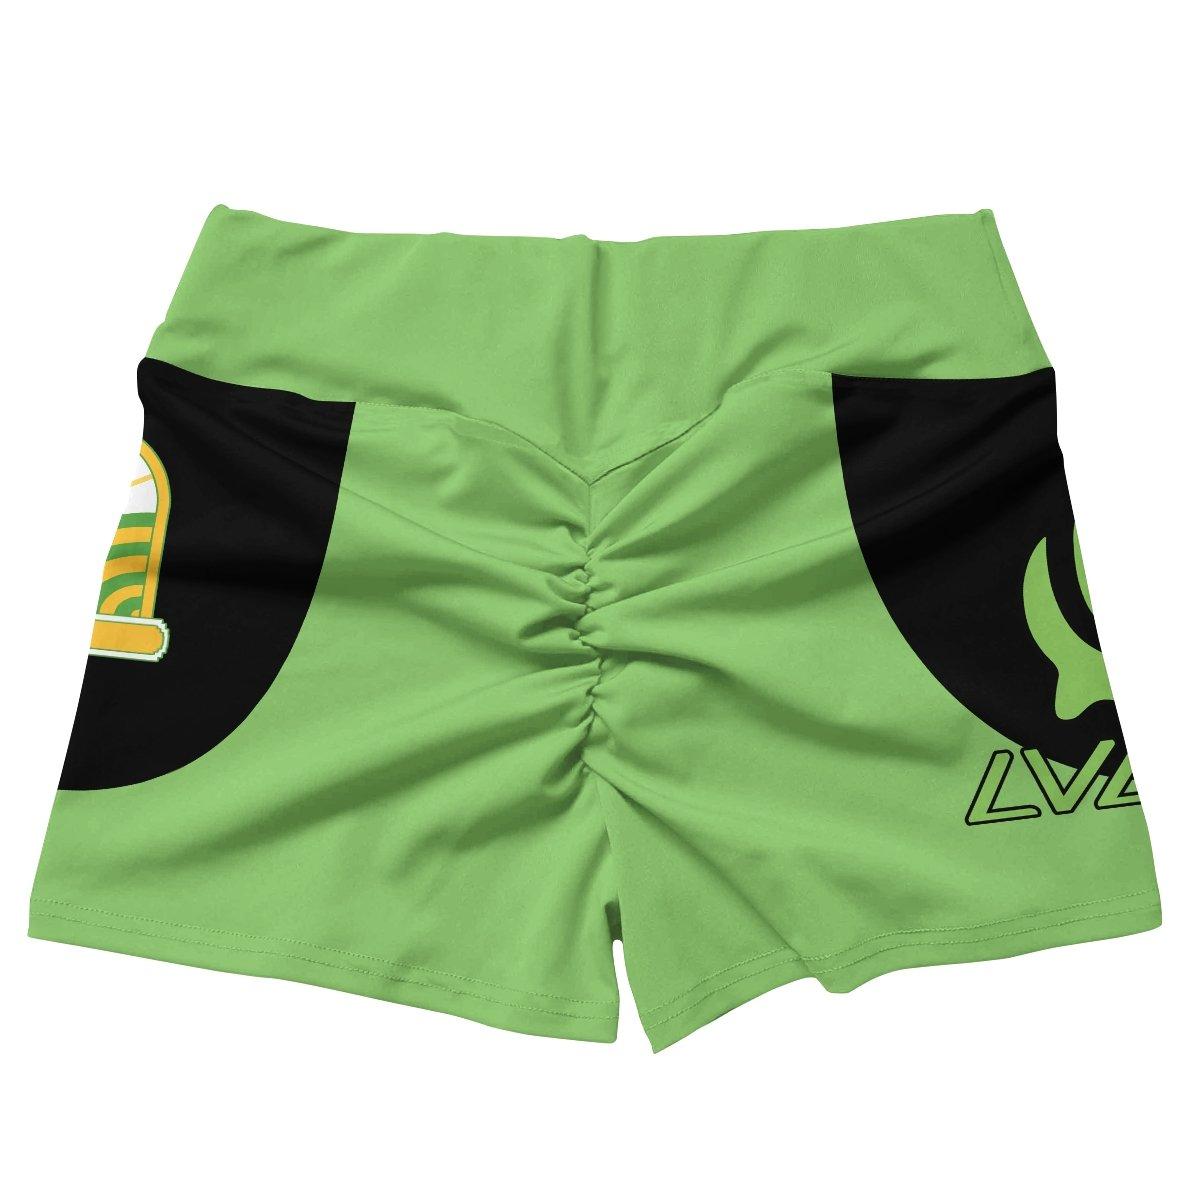 pokemon grass uniform active wear set 625123 - Anime Swimsuits